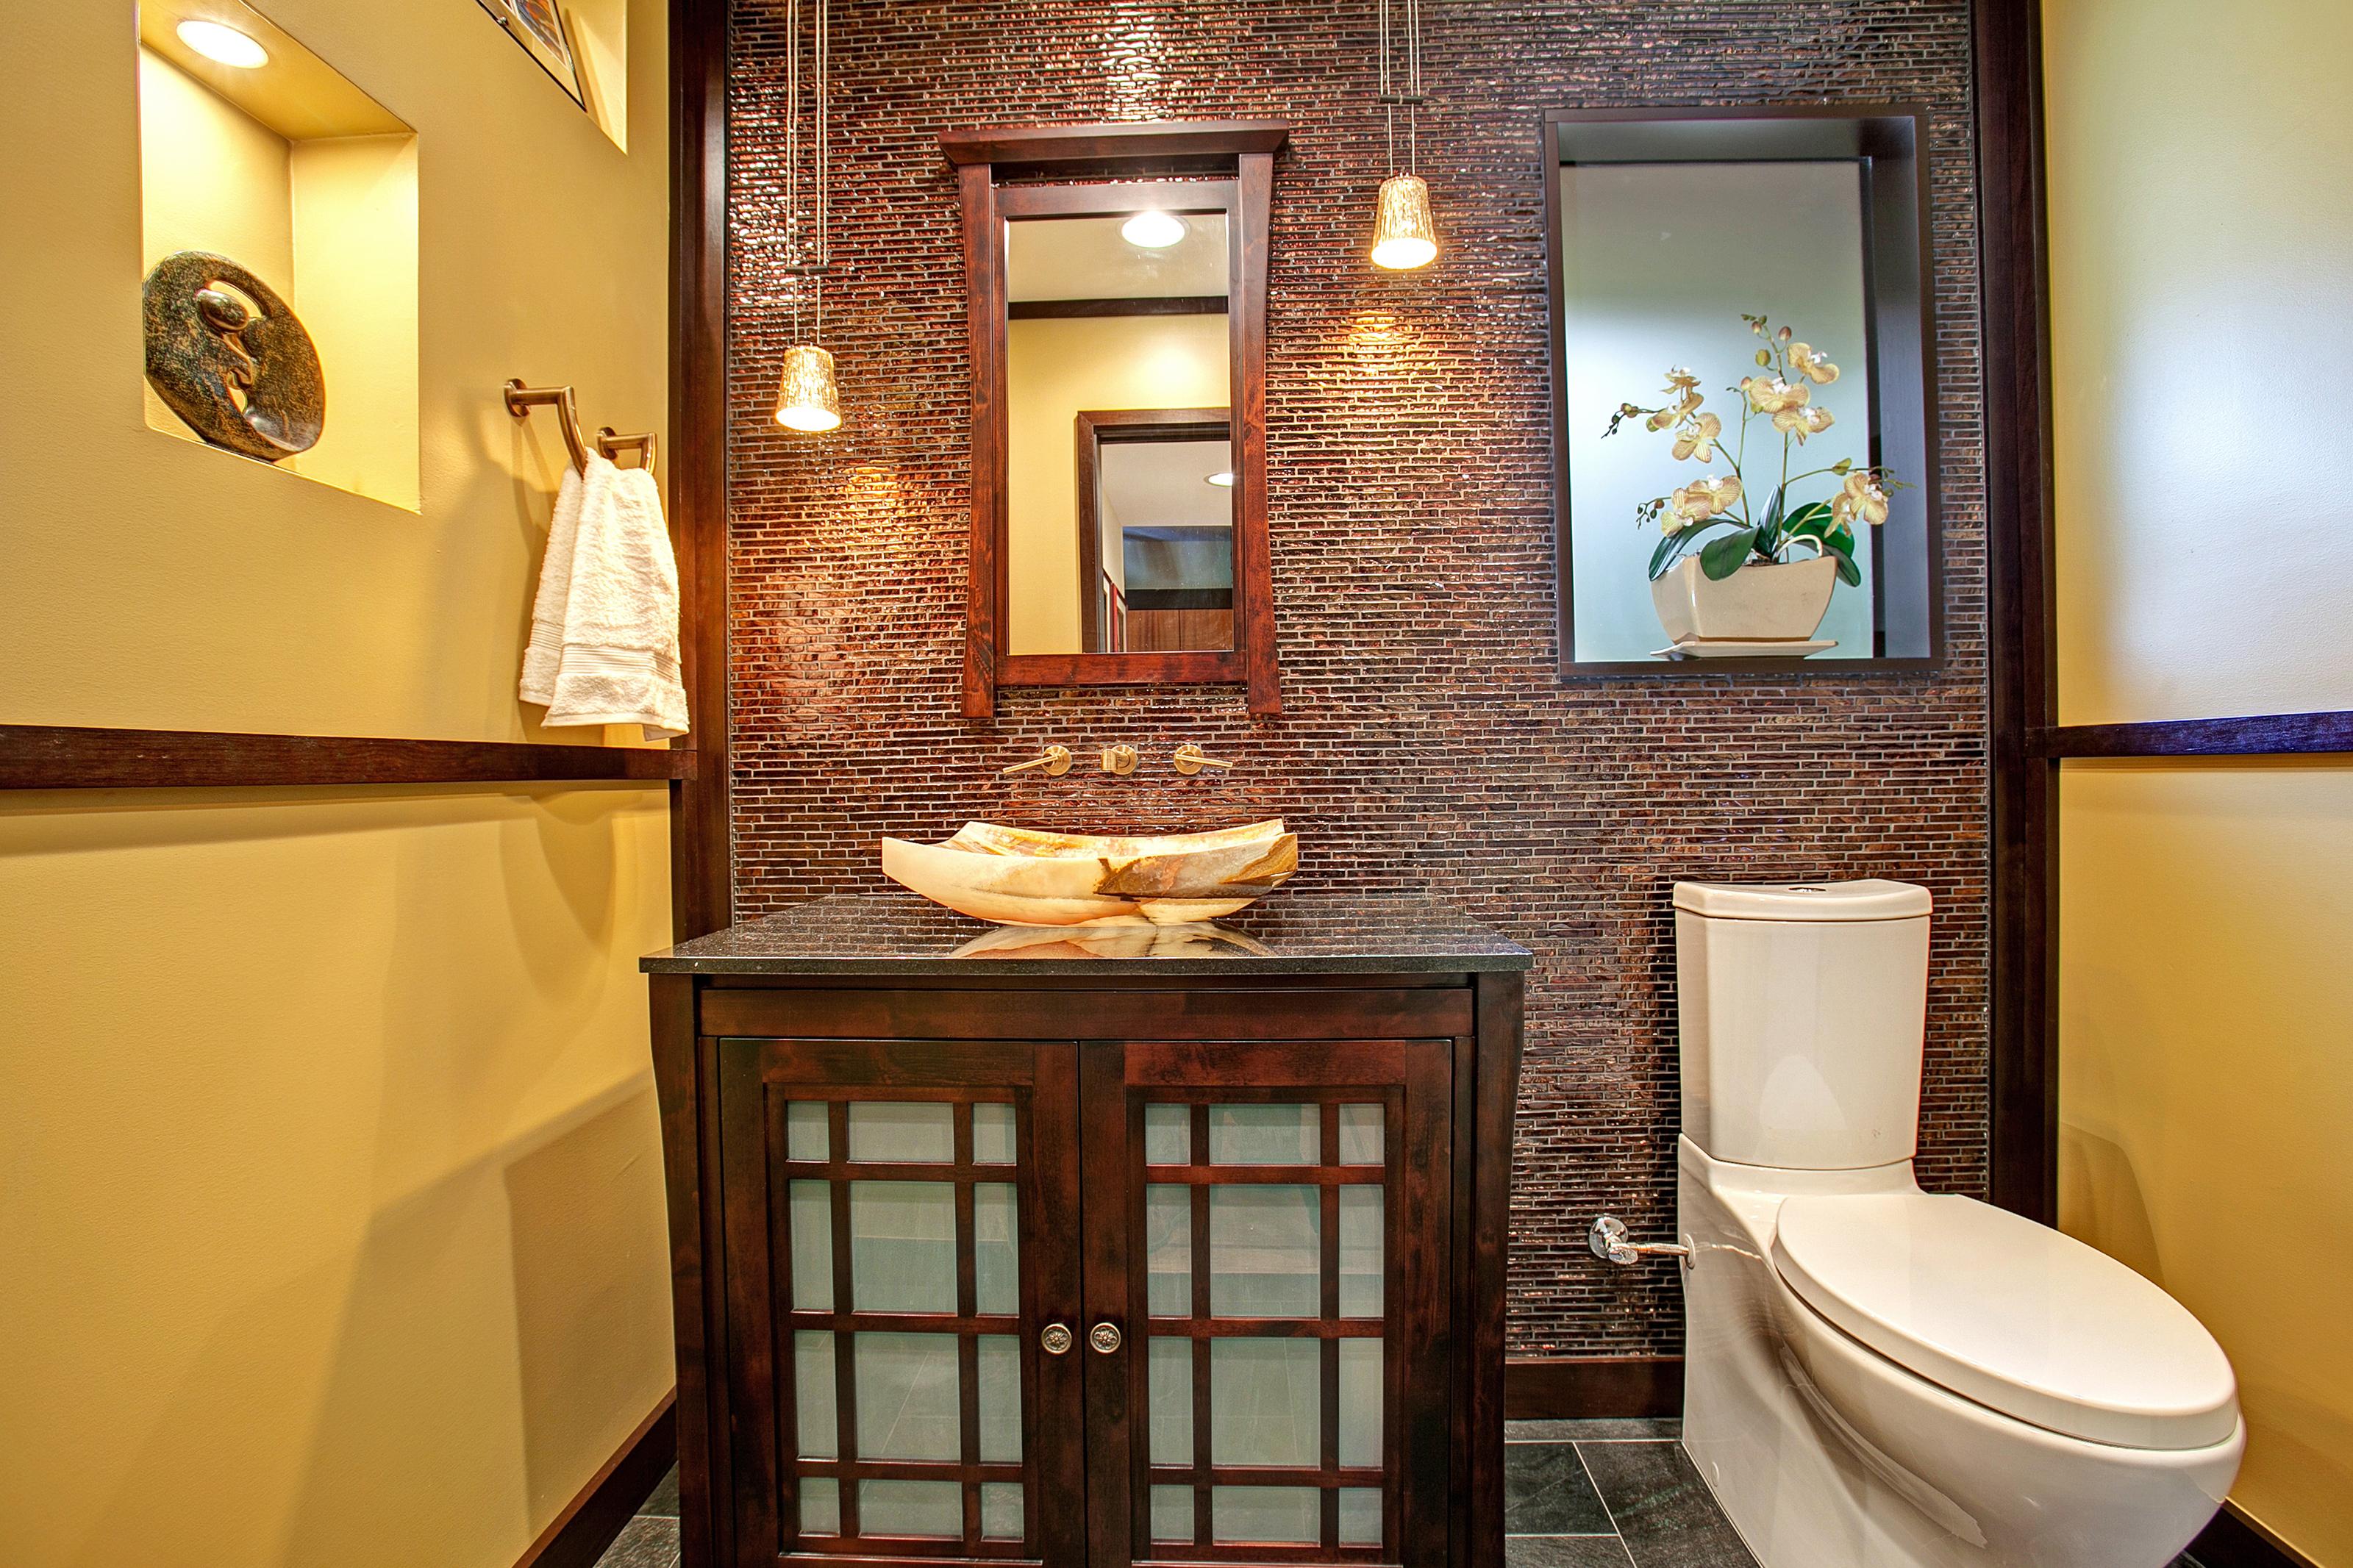 Asian Style Bathrooms - ACNN DECOR on noise maker for bathroom, asian design look, help design my bathroom, asian flowers small, asian home plans for home,